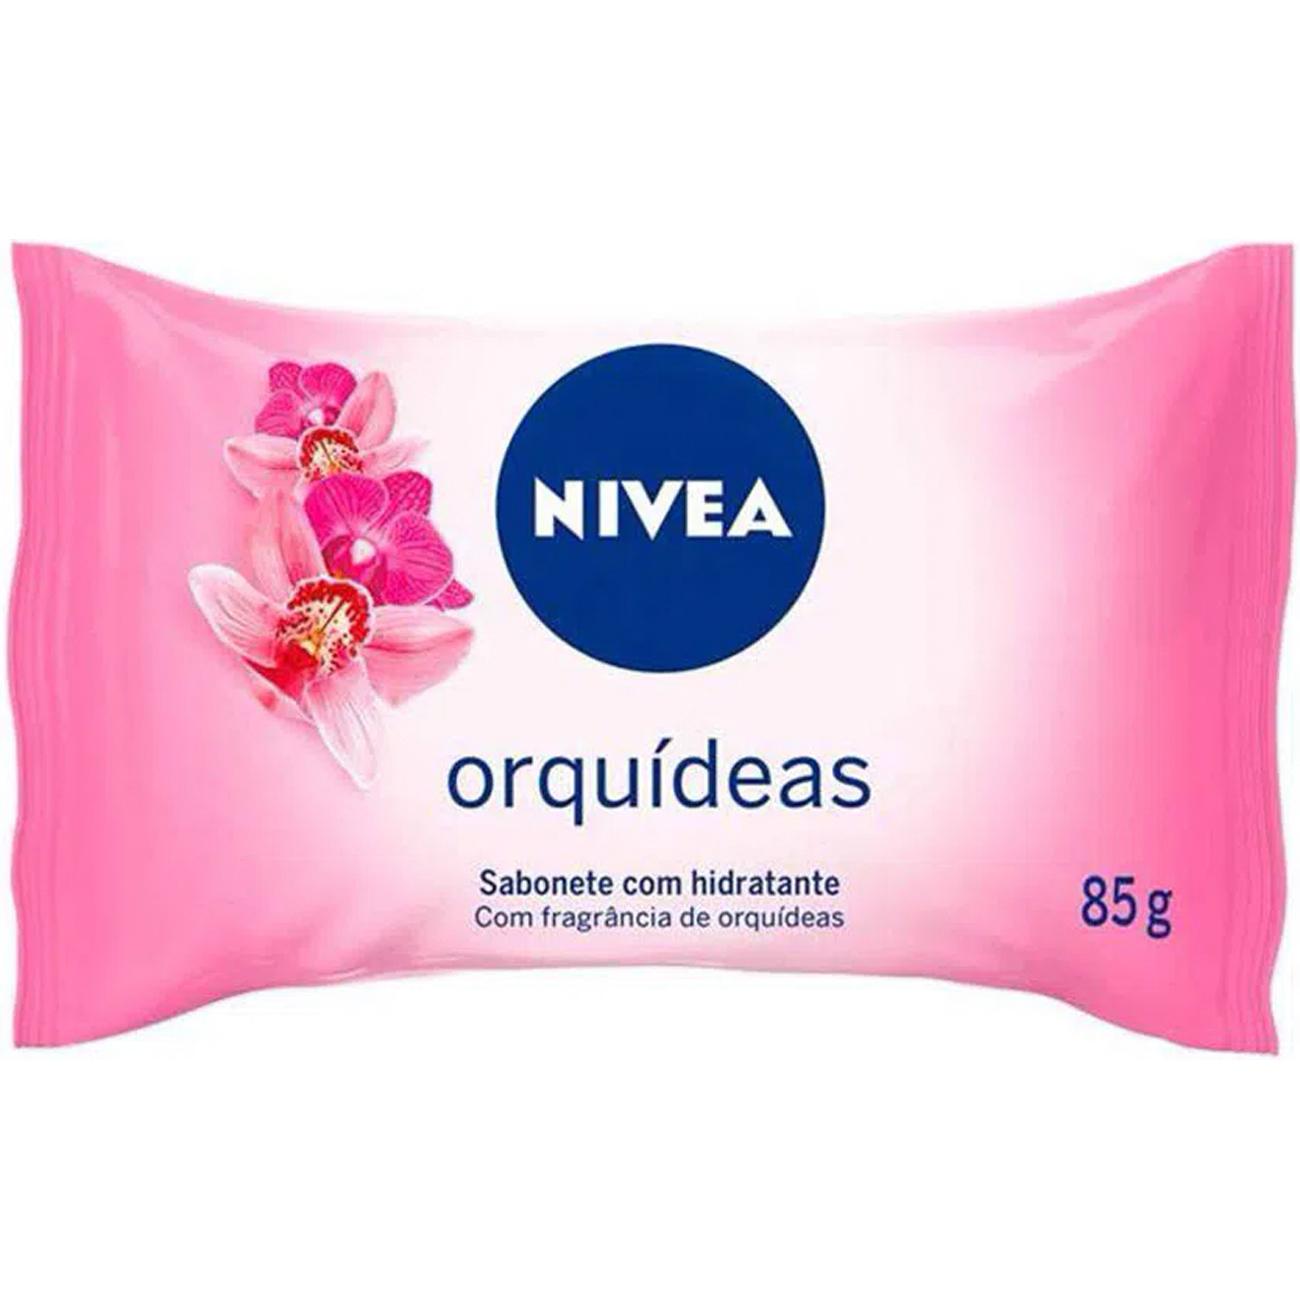 Sabonete Nivea Hidratante 85g Orquideas